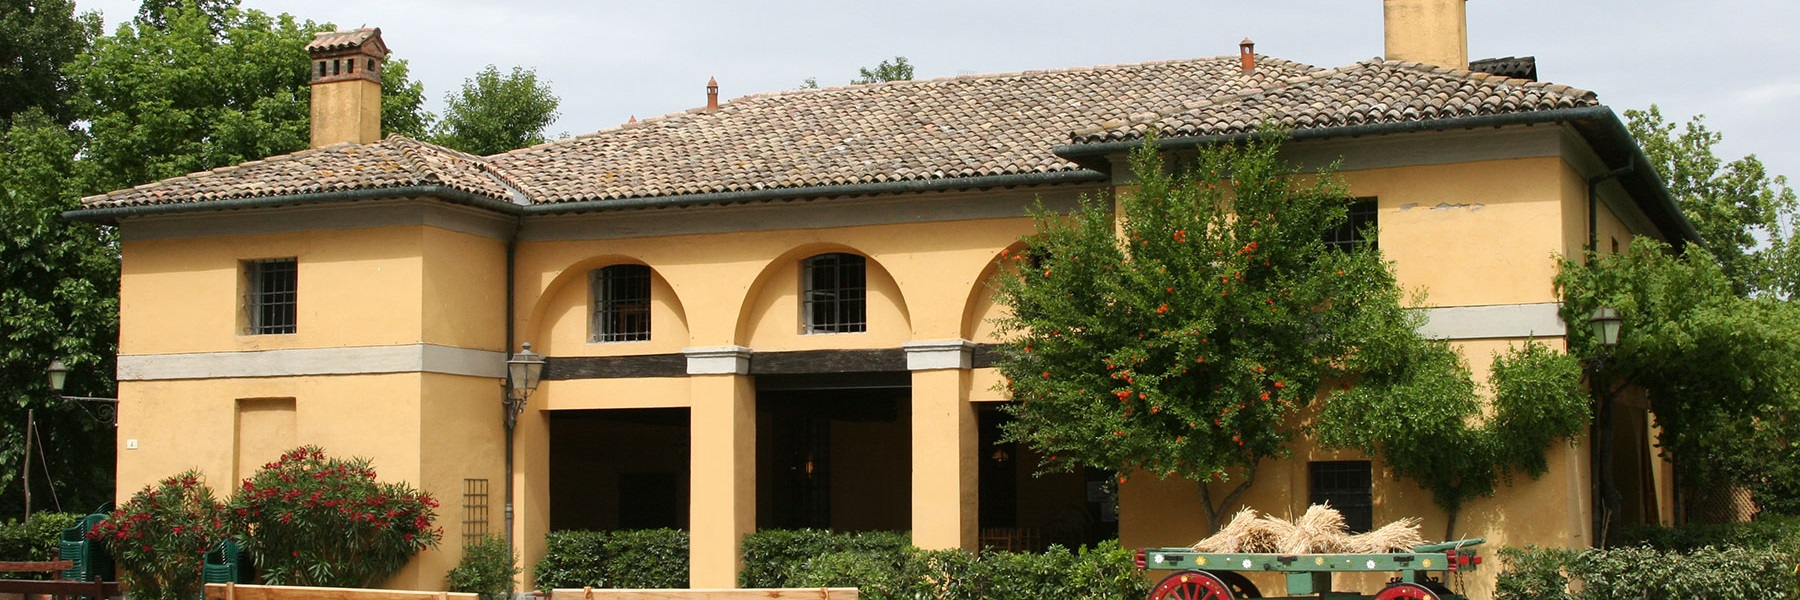 La Casa delle Aie (Farmyard house)